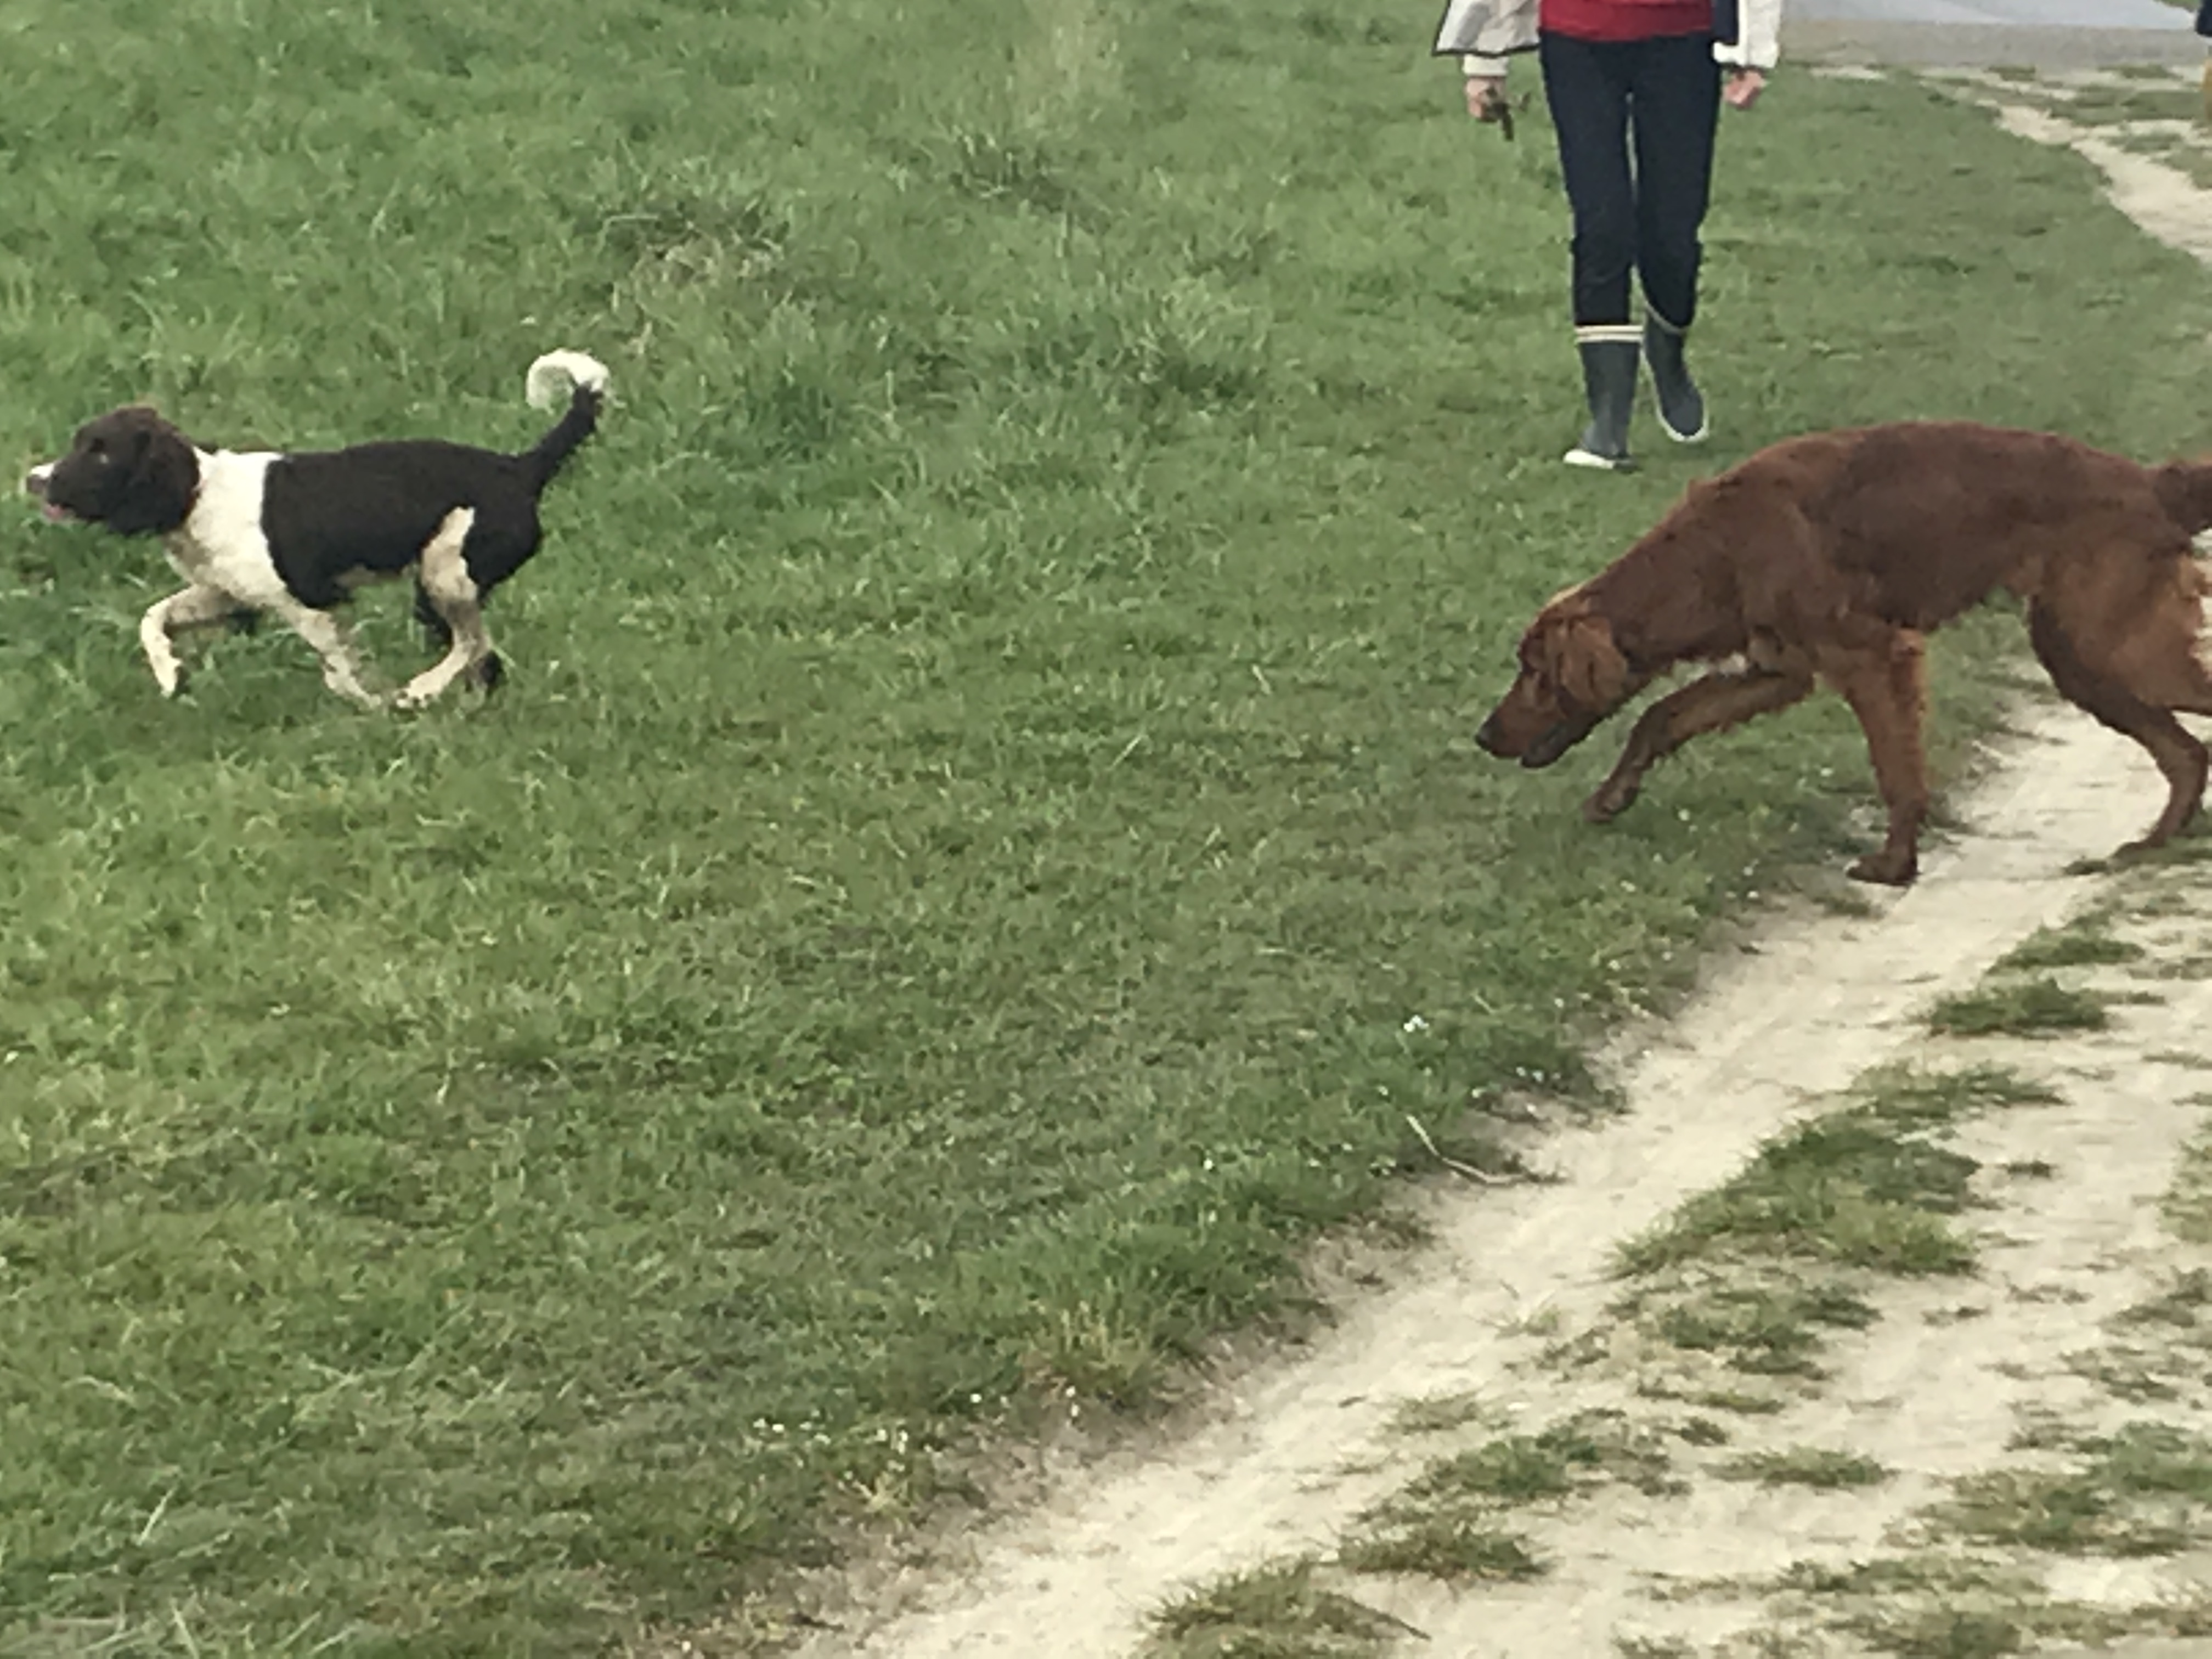 Wandeling Hondenschool Hulst 8 april